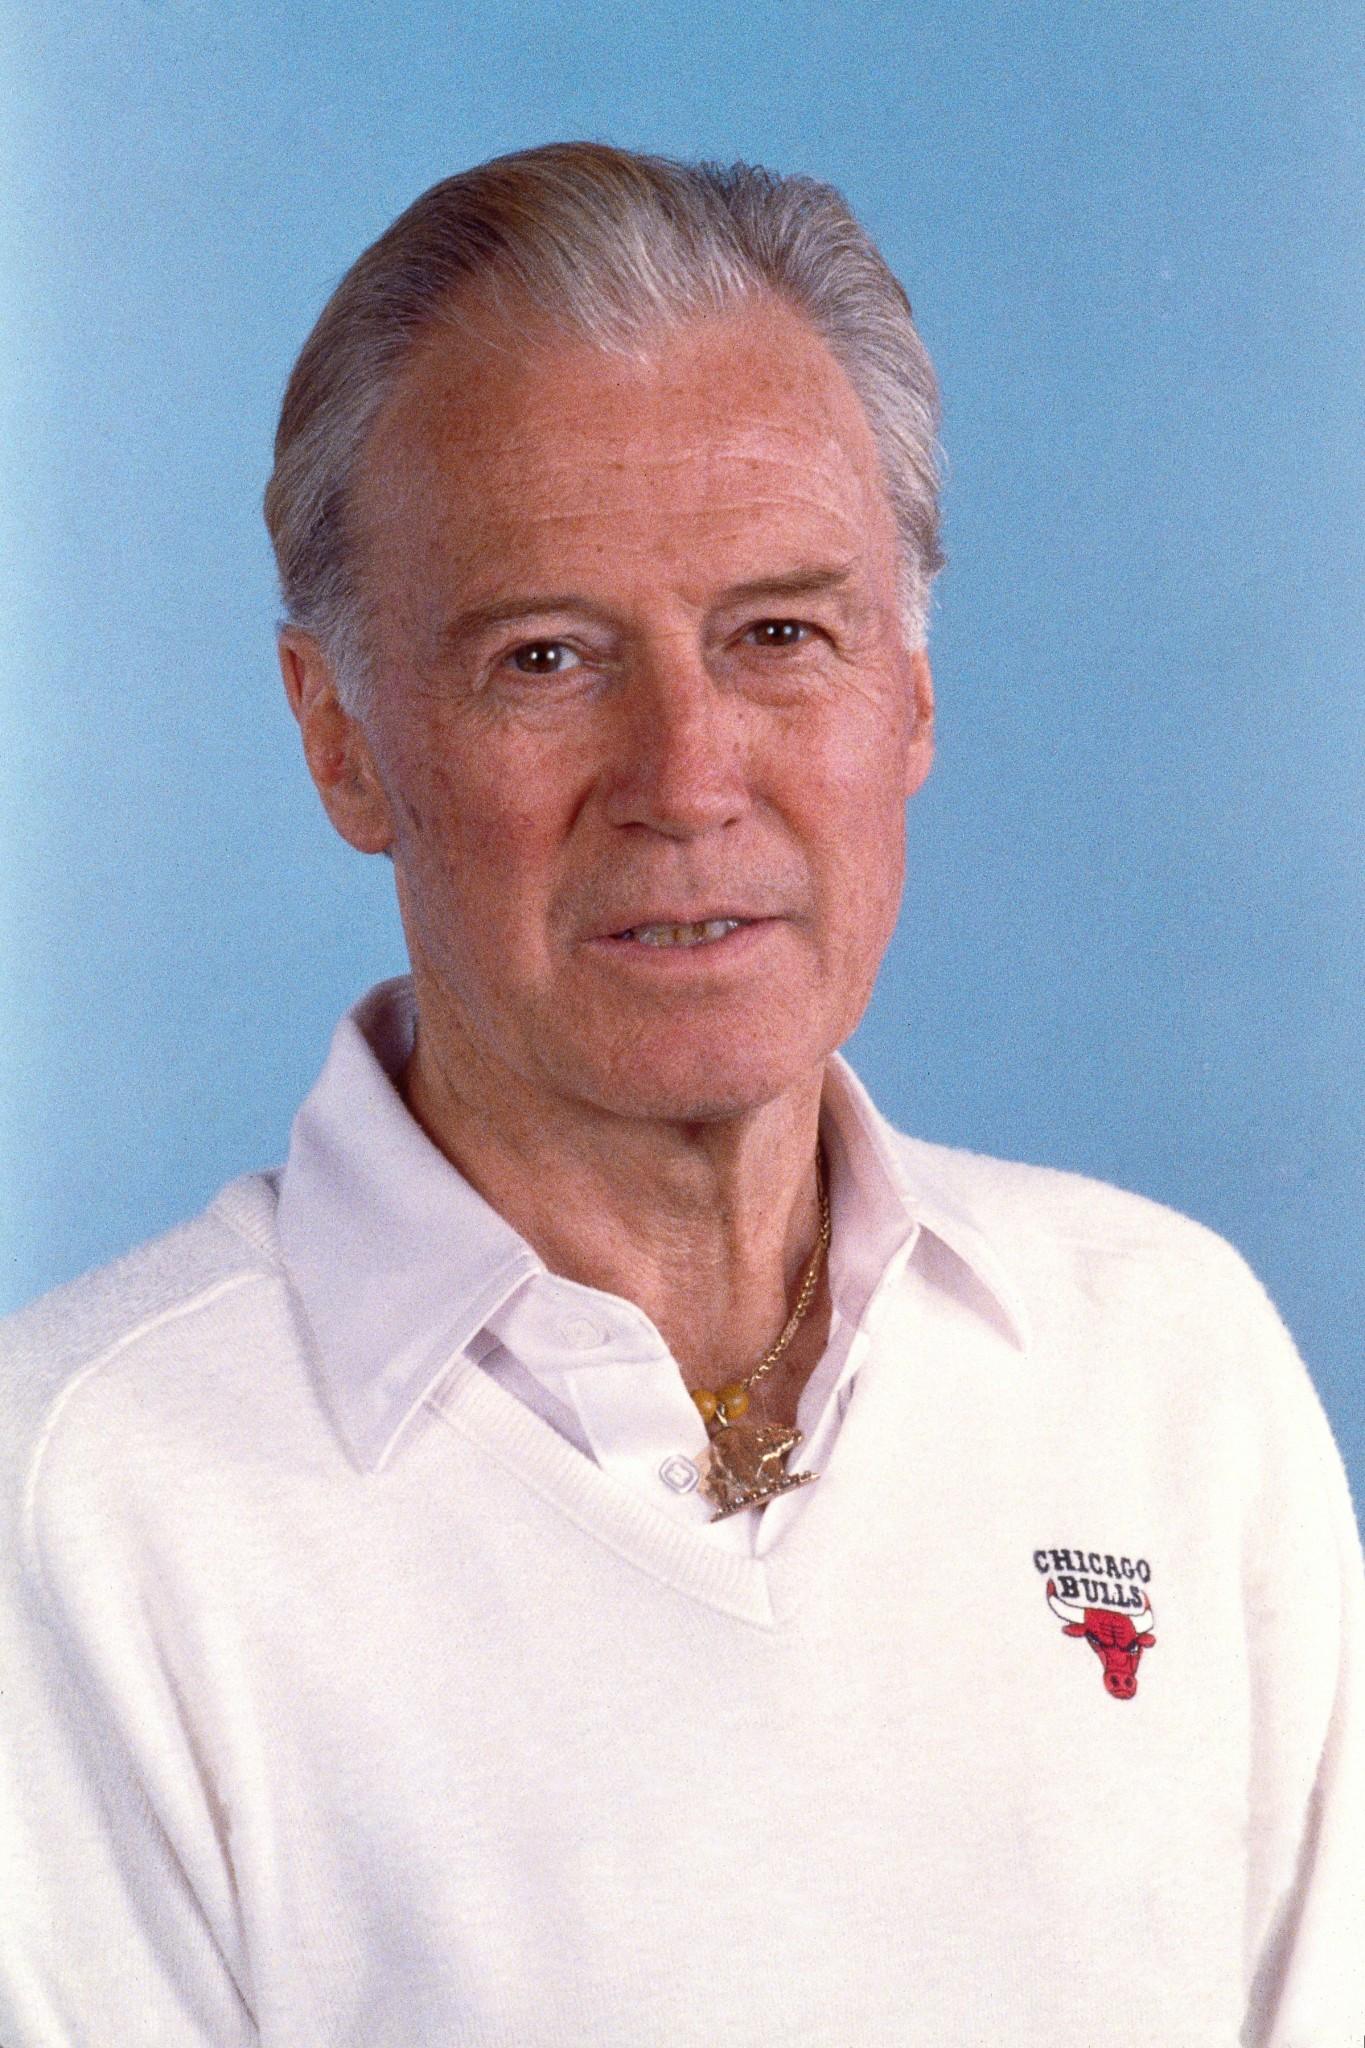 1991-92 - Johnny Bach - Bulls Head Shot 1991